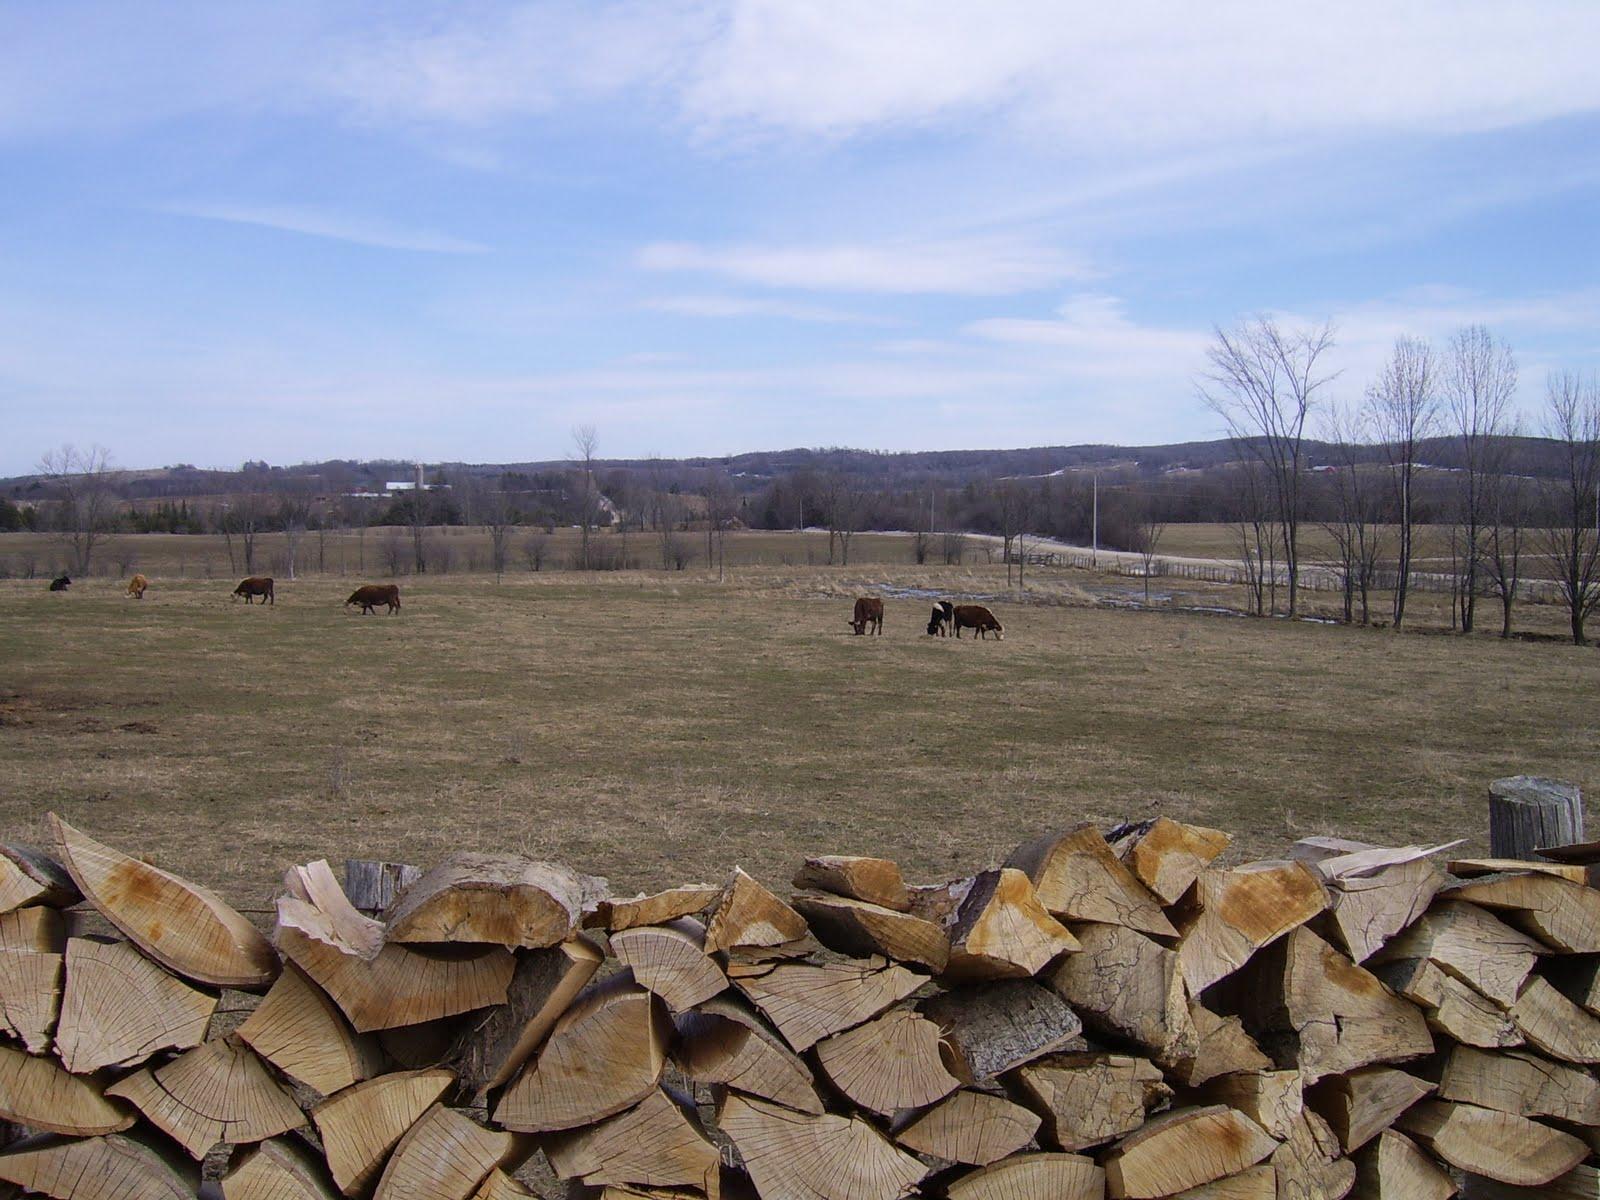 http://3.bp.blogspot.com/_Sv08qmYwUpE/TBkz8YQWe-I/AAAAAAAACFk/hF9fw9K0nJY/s1600/Ramage+Farm+March+2010+014.jpg